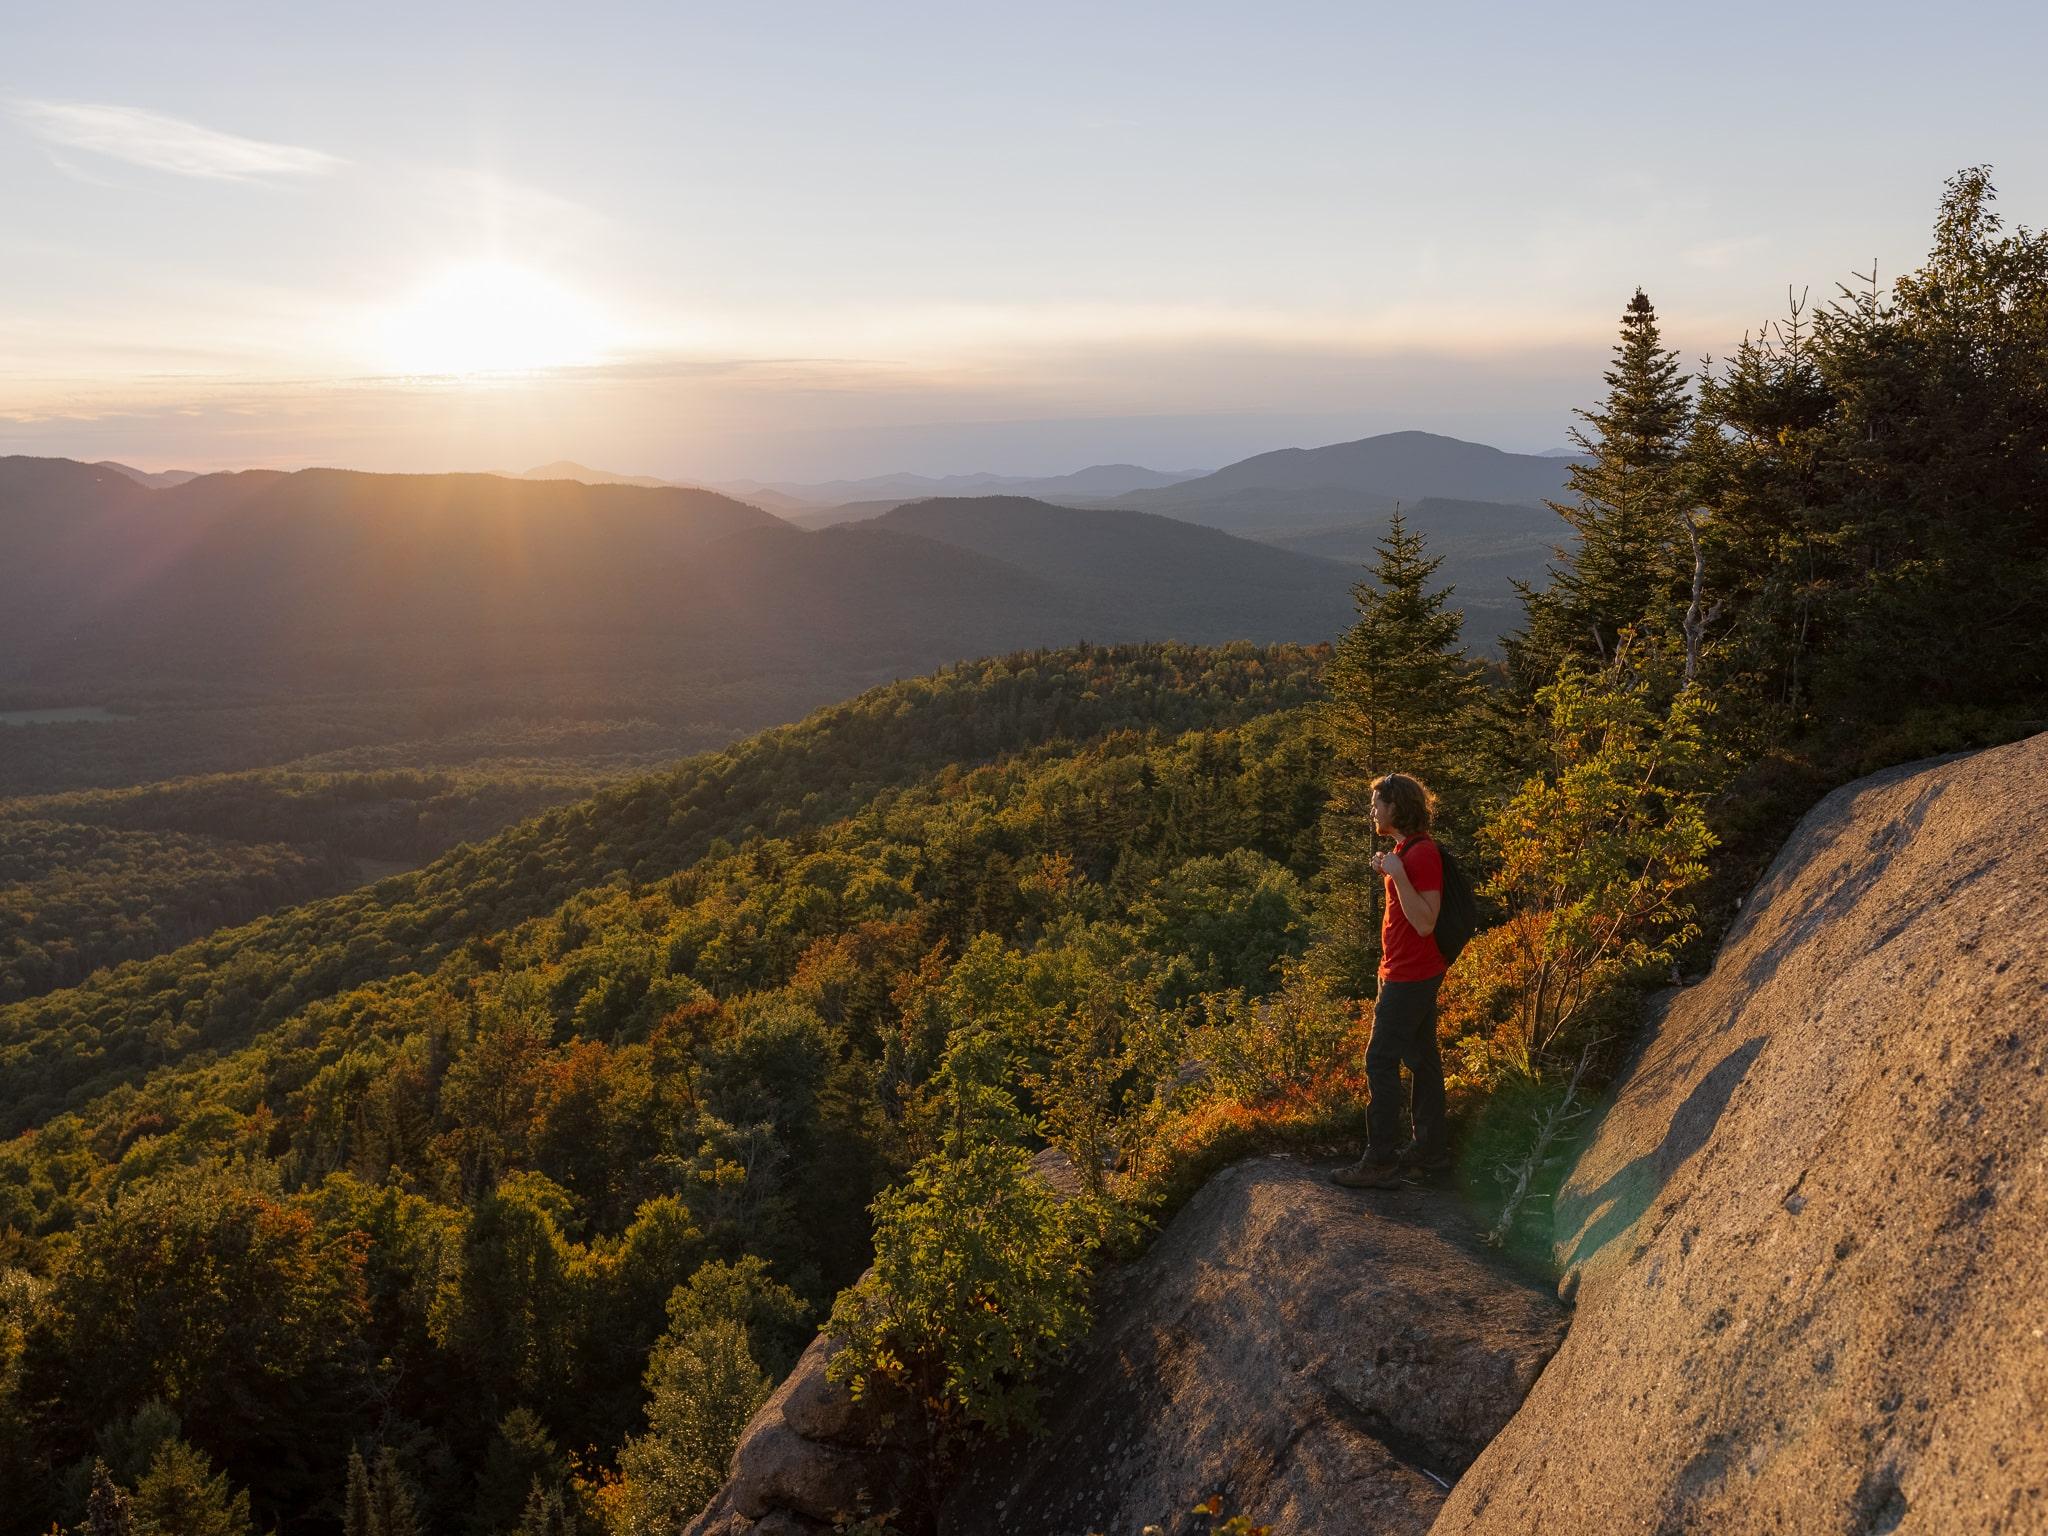 Ridge of Mt Van Hoevenberg West Trail near Lake Placid in the Adirondacks